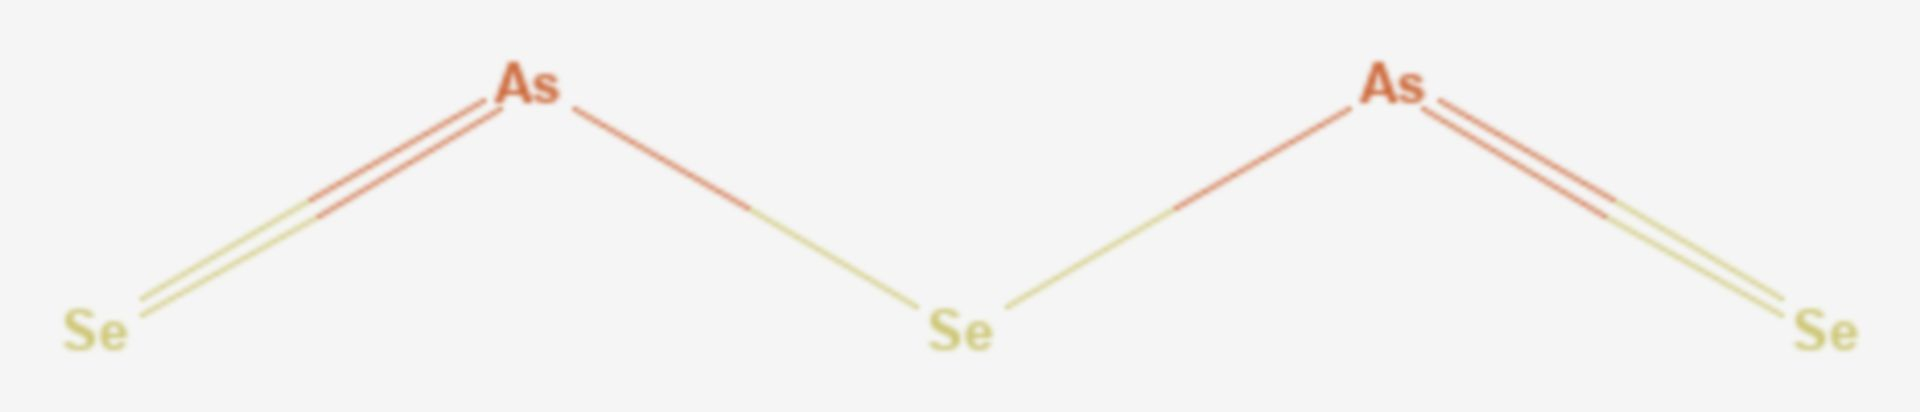 Arsen(III)-selenid (Strukturformel)